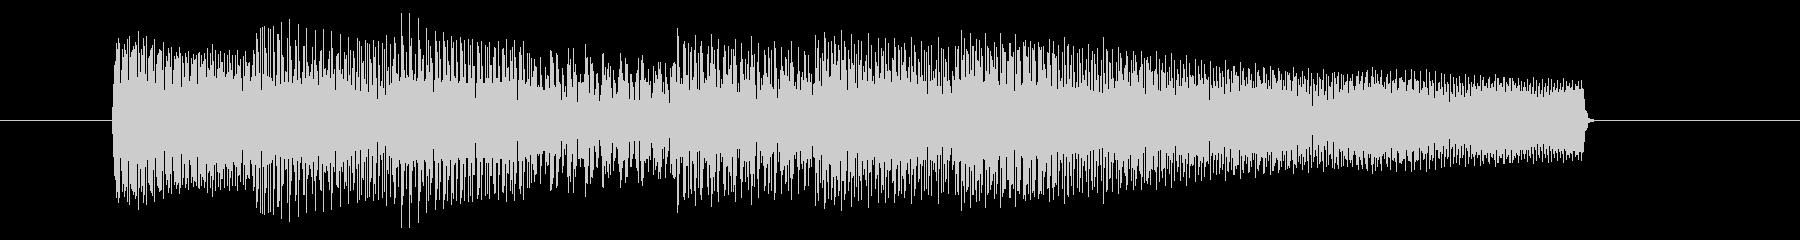 NES 汎用 C06-2(クリア2)の未再生の波形